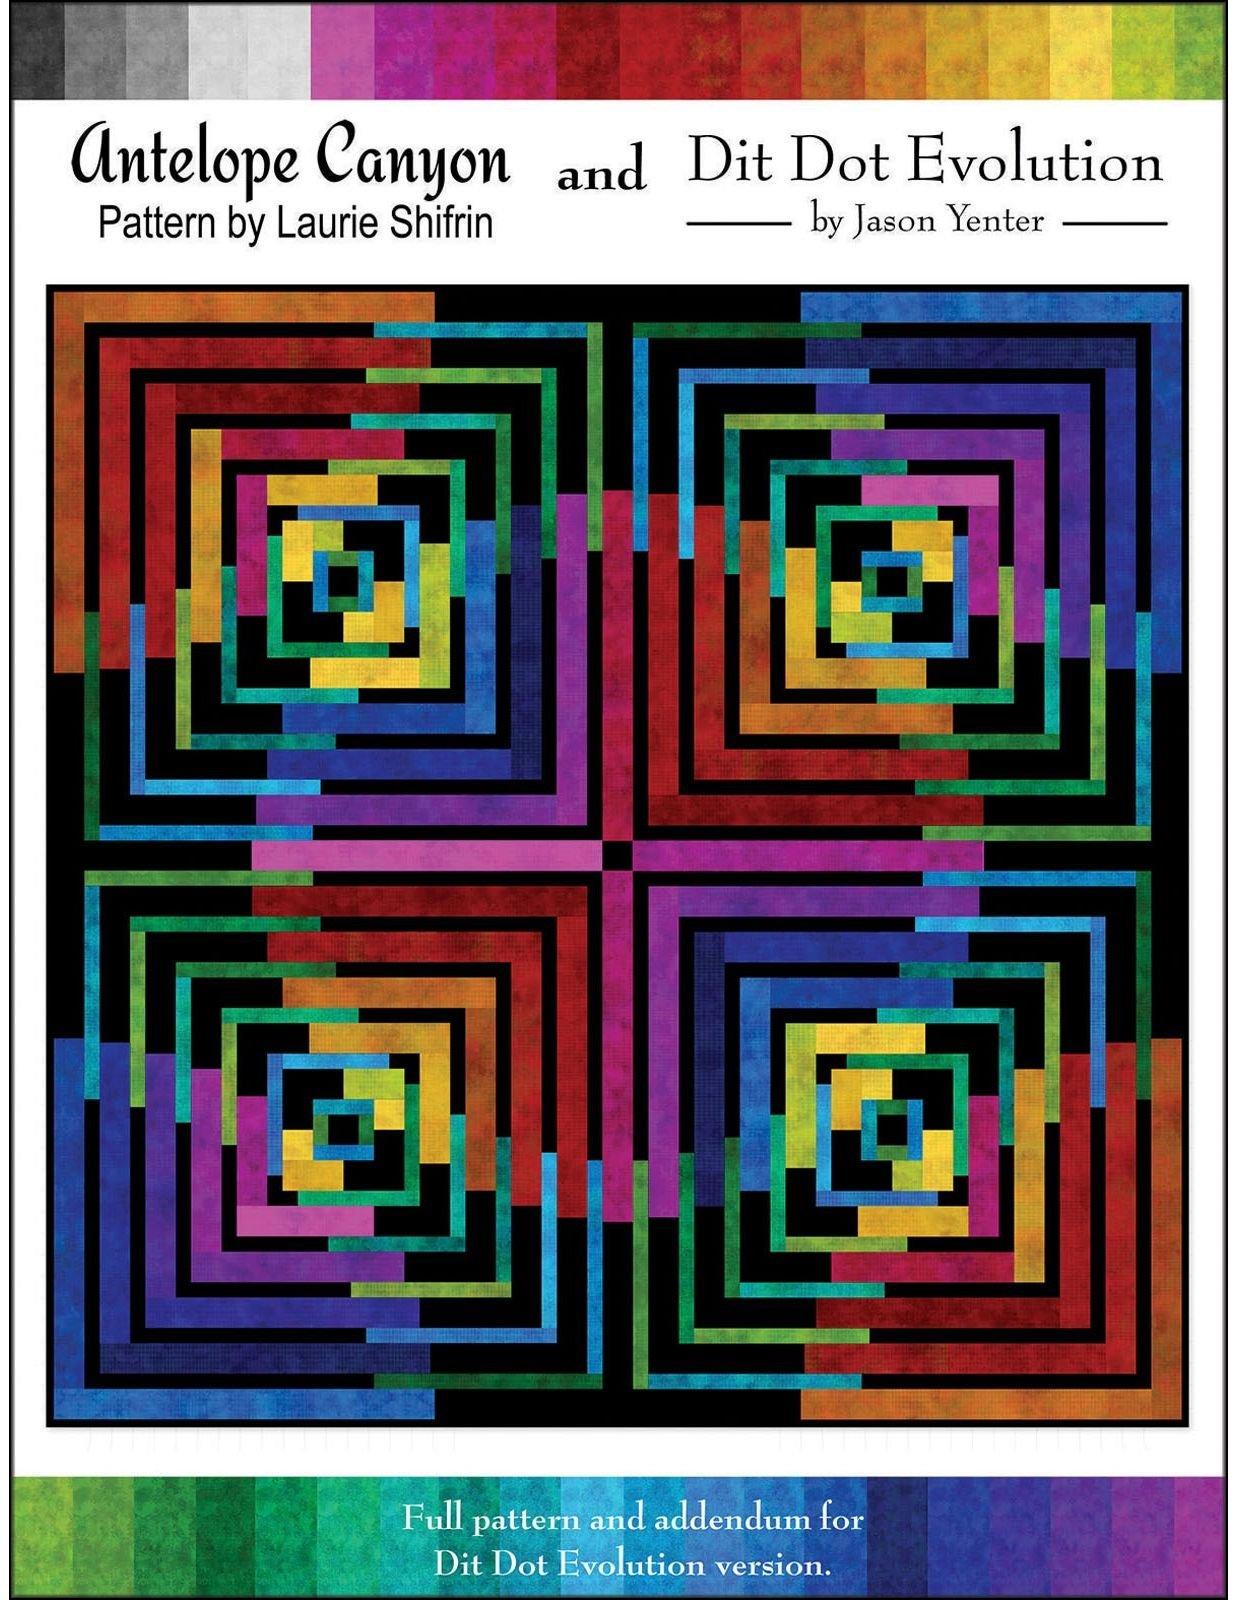 Antelope Canyon - Dit Dot Evolution Pattern - LSDDDEAC